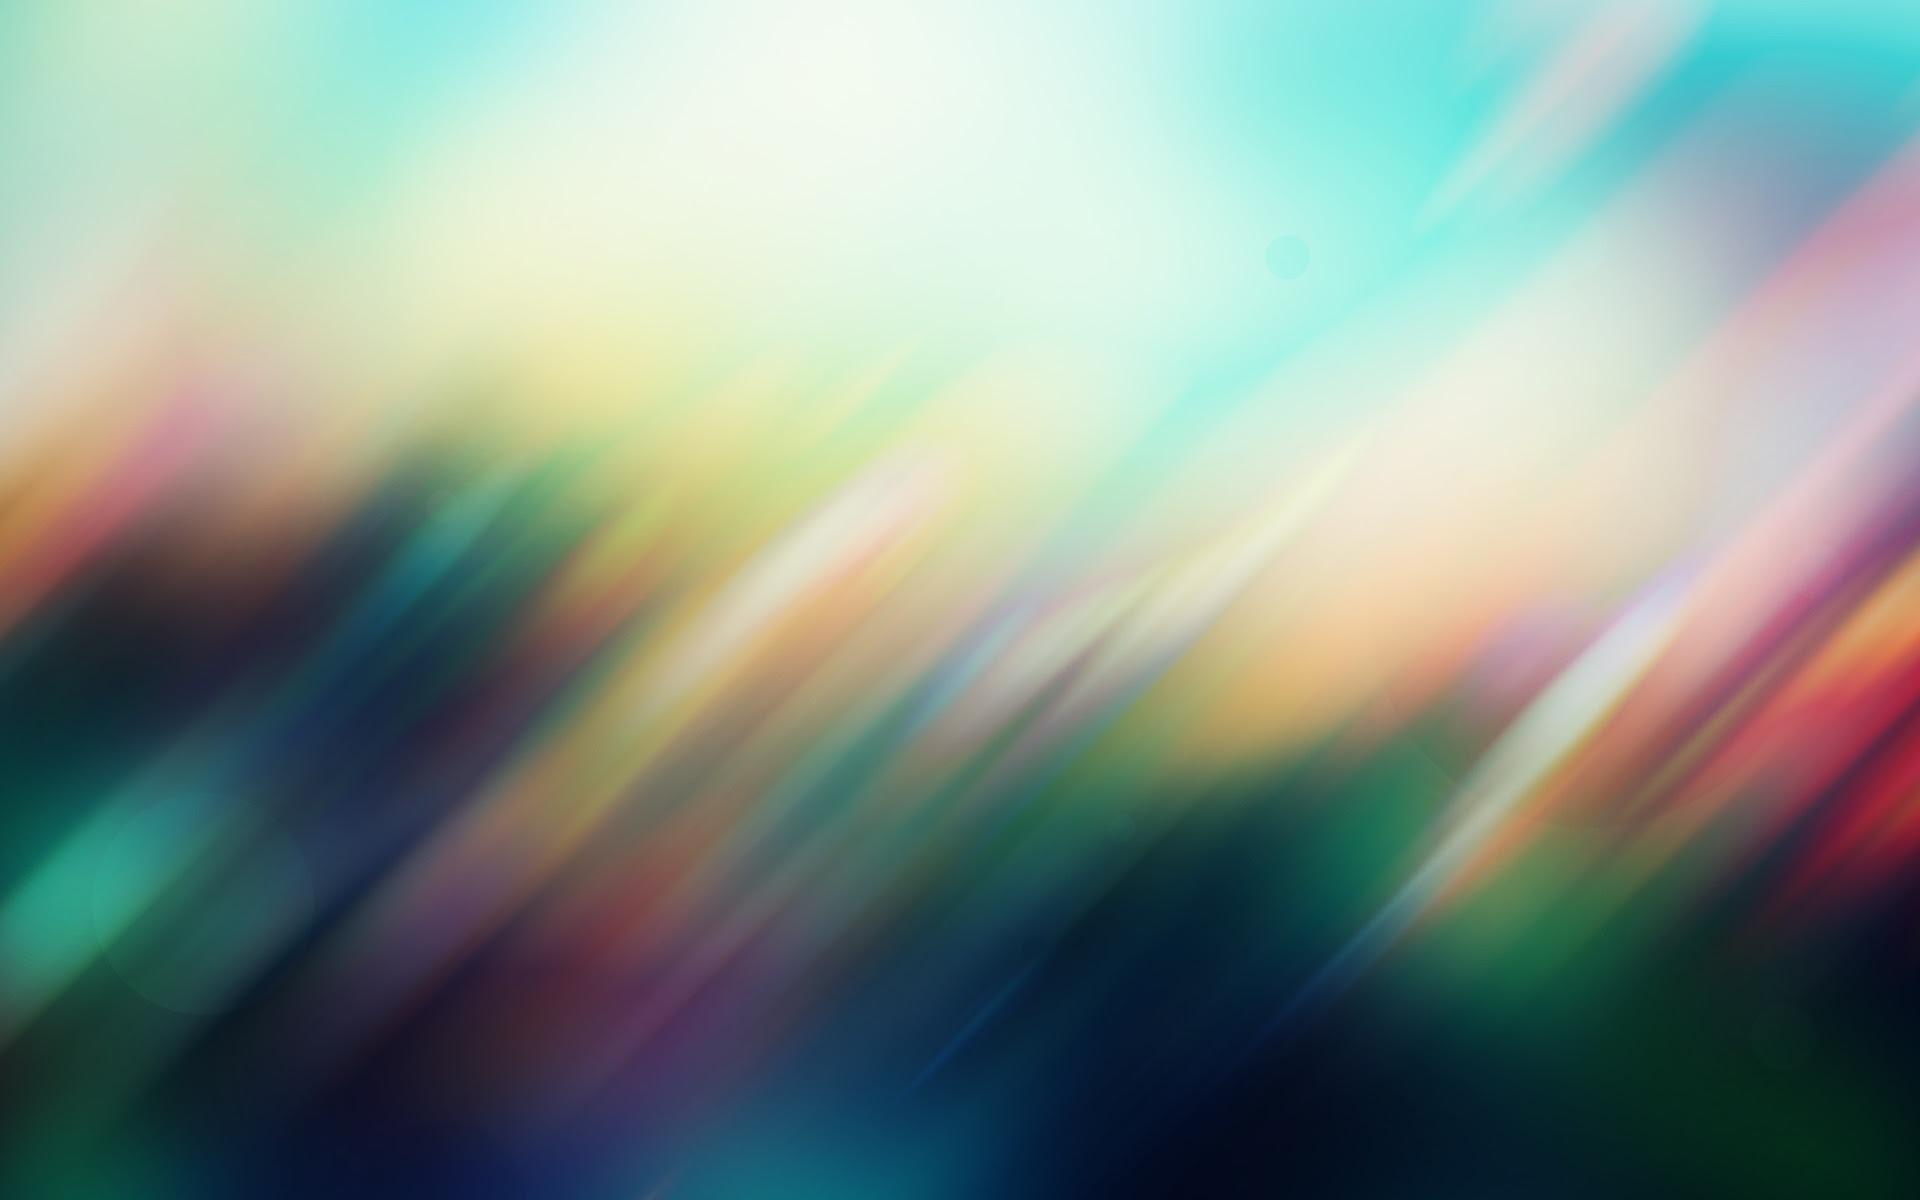 Blurr Part Of Image Digital Download Digital Imaging